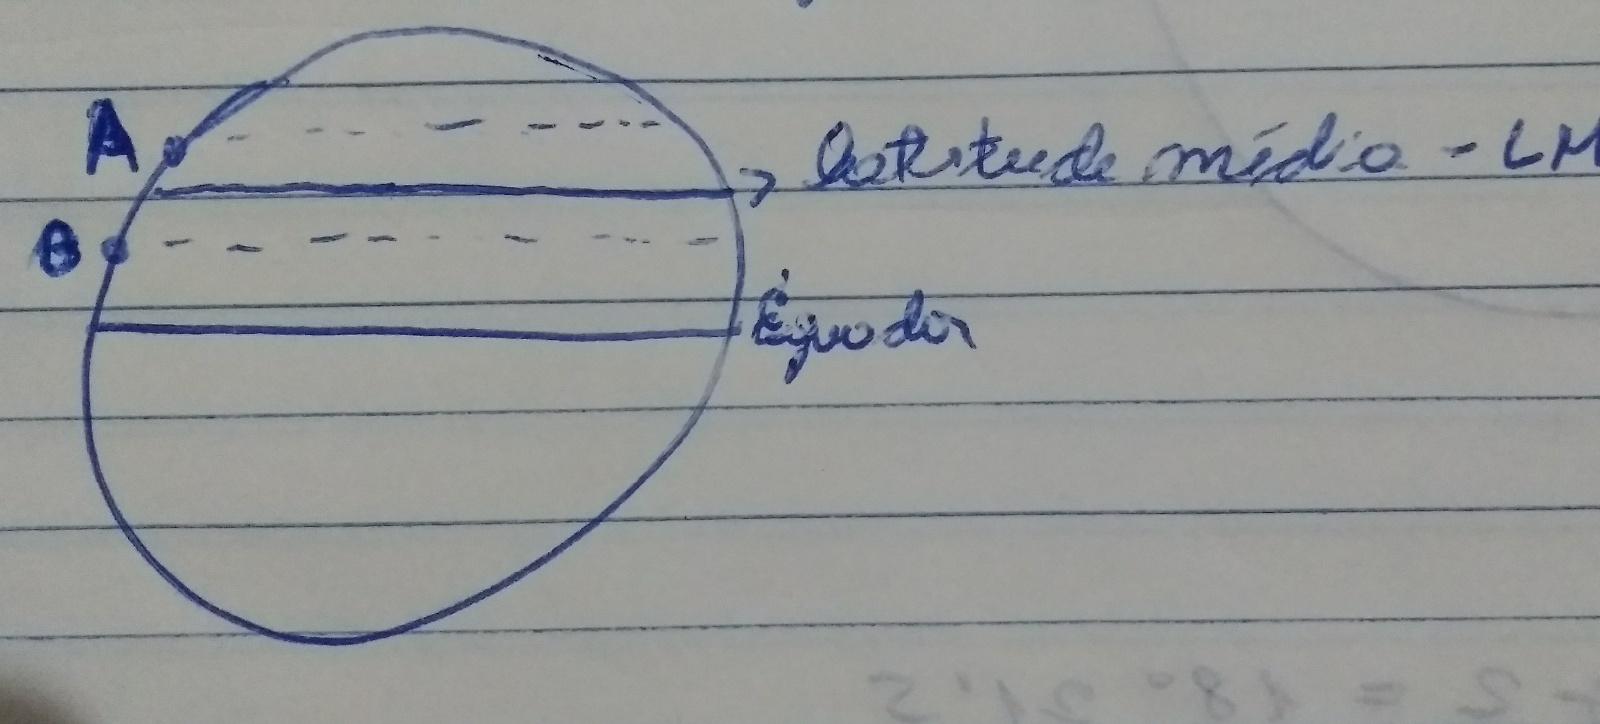 latitudemediamesmohemisferio